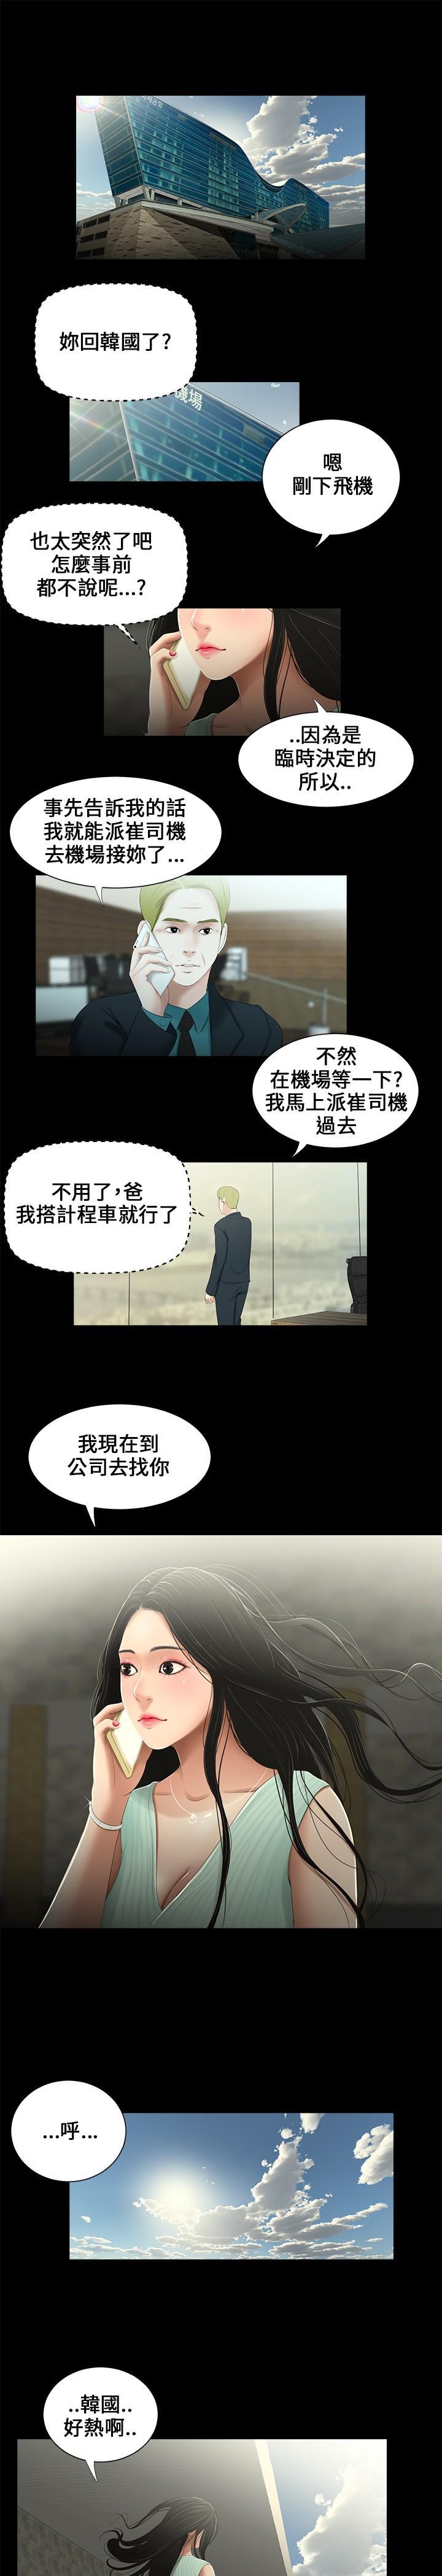 Three sisters 三姐妹Ch.13~19 (Chinese)中文 77